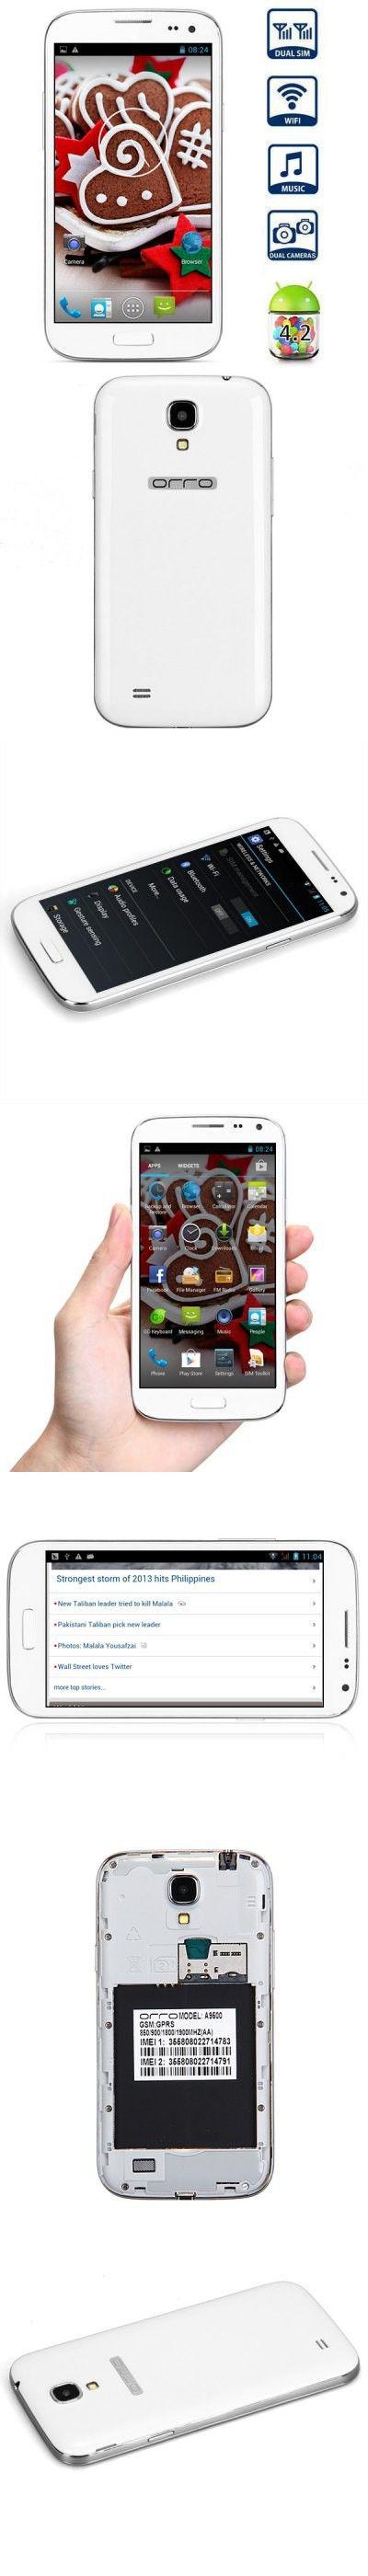 A9500 5.0 inch Phablet MT6572 Dual Core 1.2GHz WVGA Screen Dual SIM Bluetooth